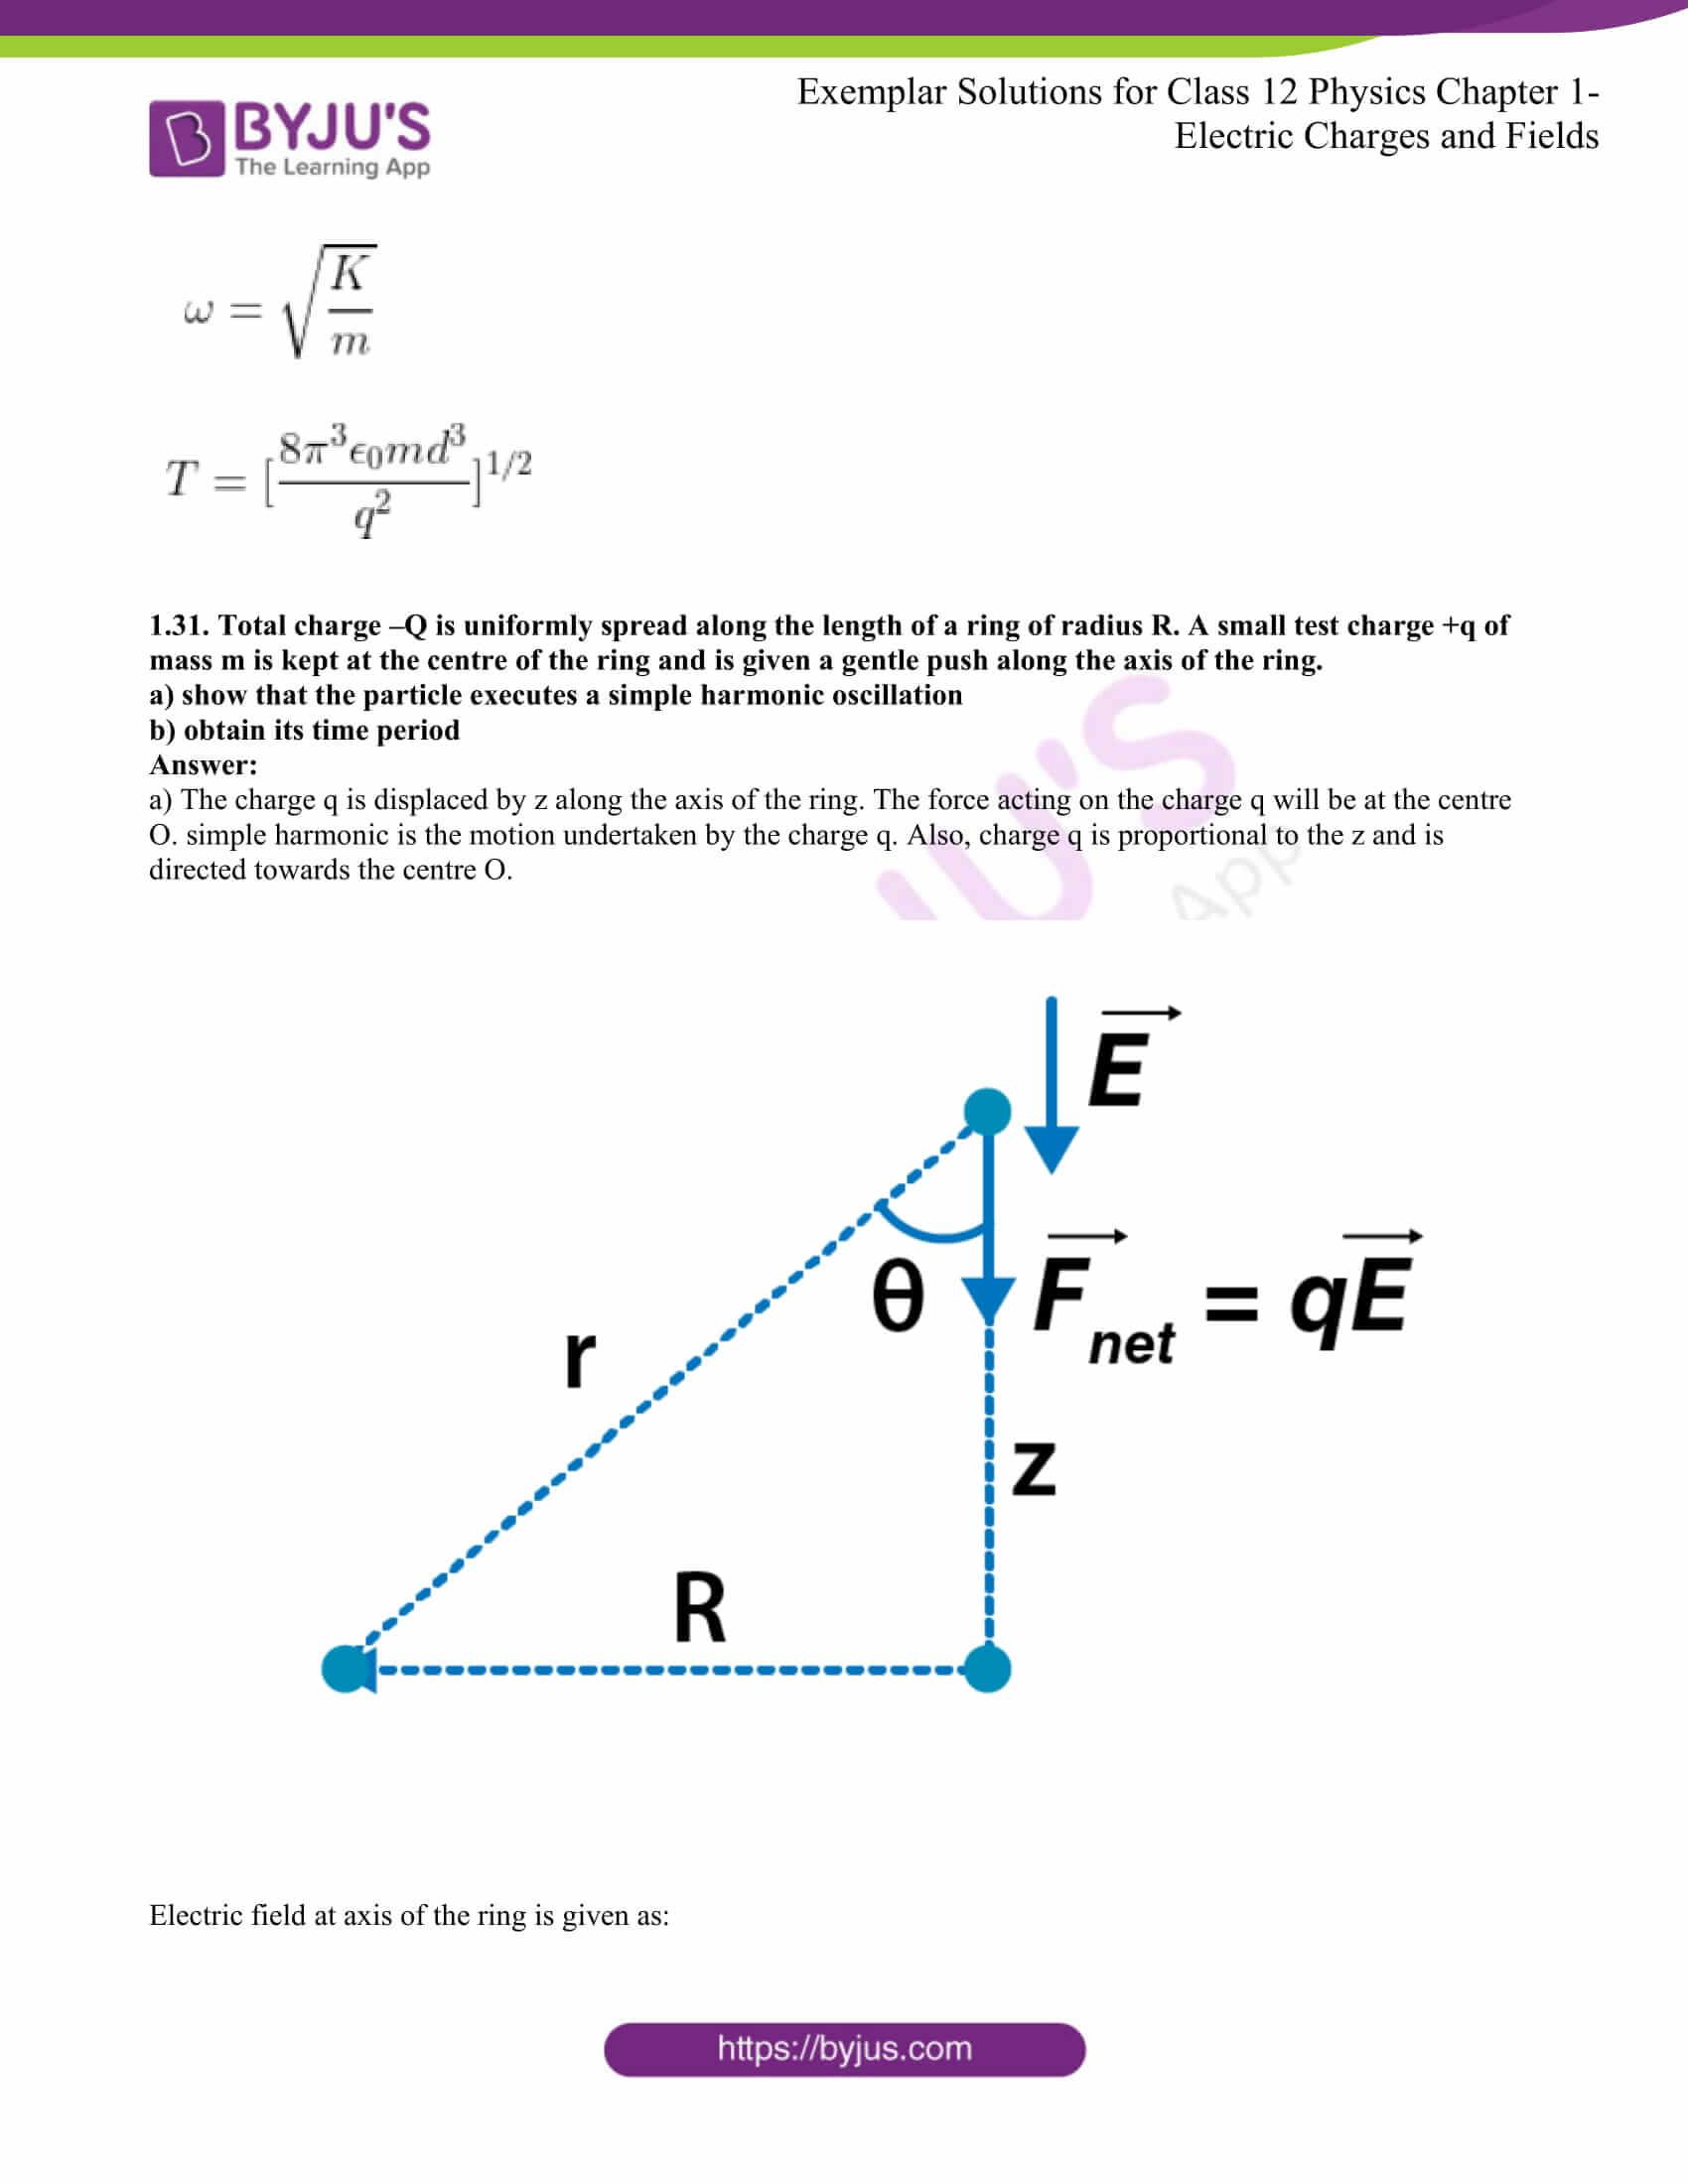 ncert exemplar for class 12 phy chapter 1 32